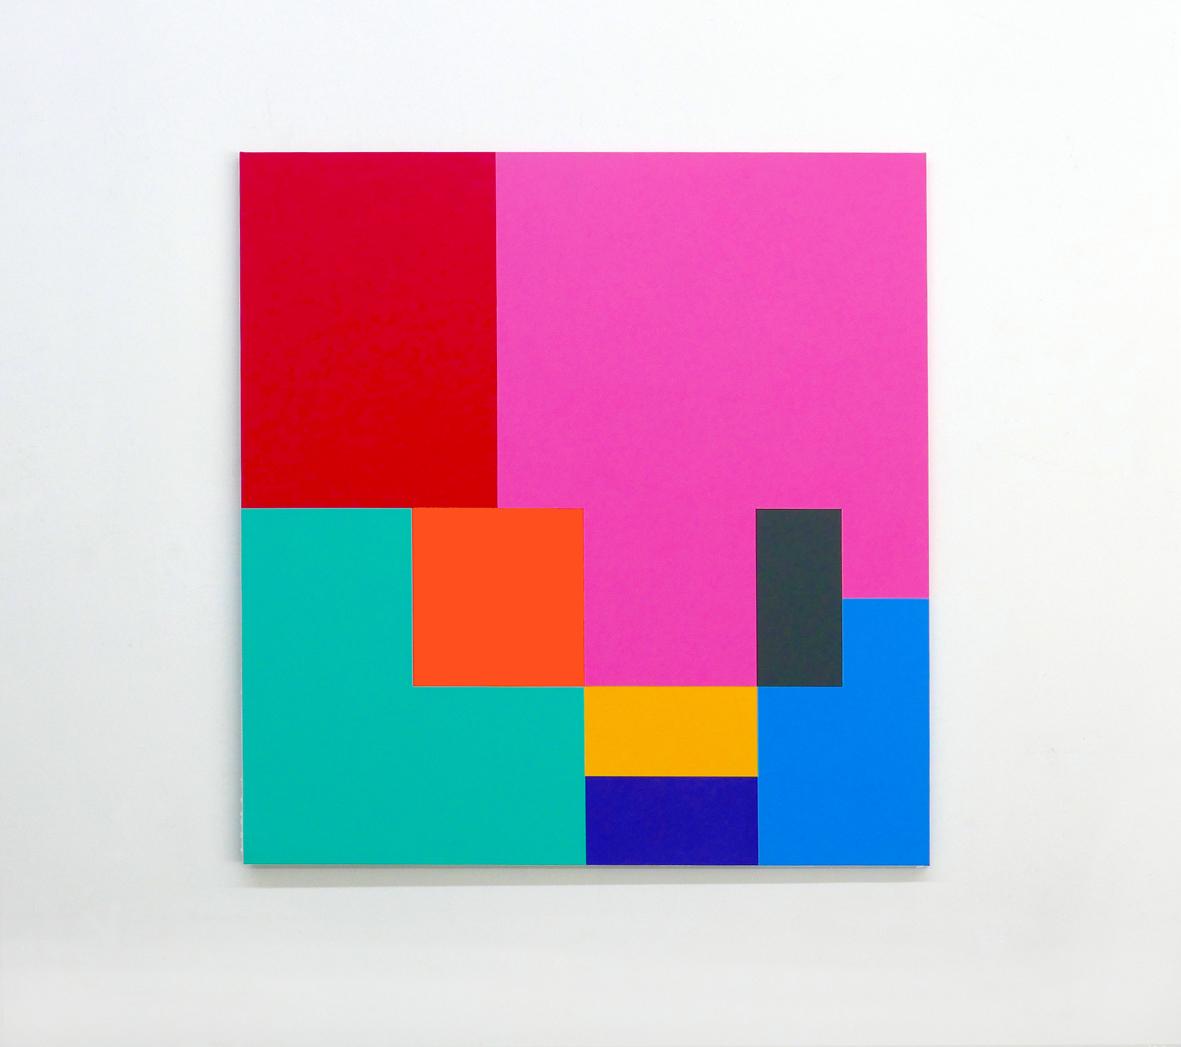 ROBERT OWEN   Proportio #1  2016 Synthetic polymer paint on linen 122 x 122 cm